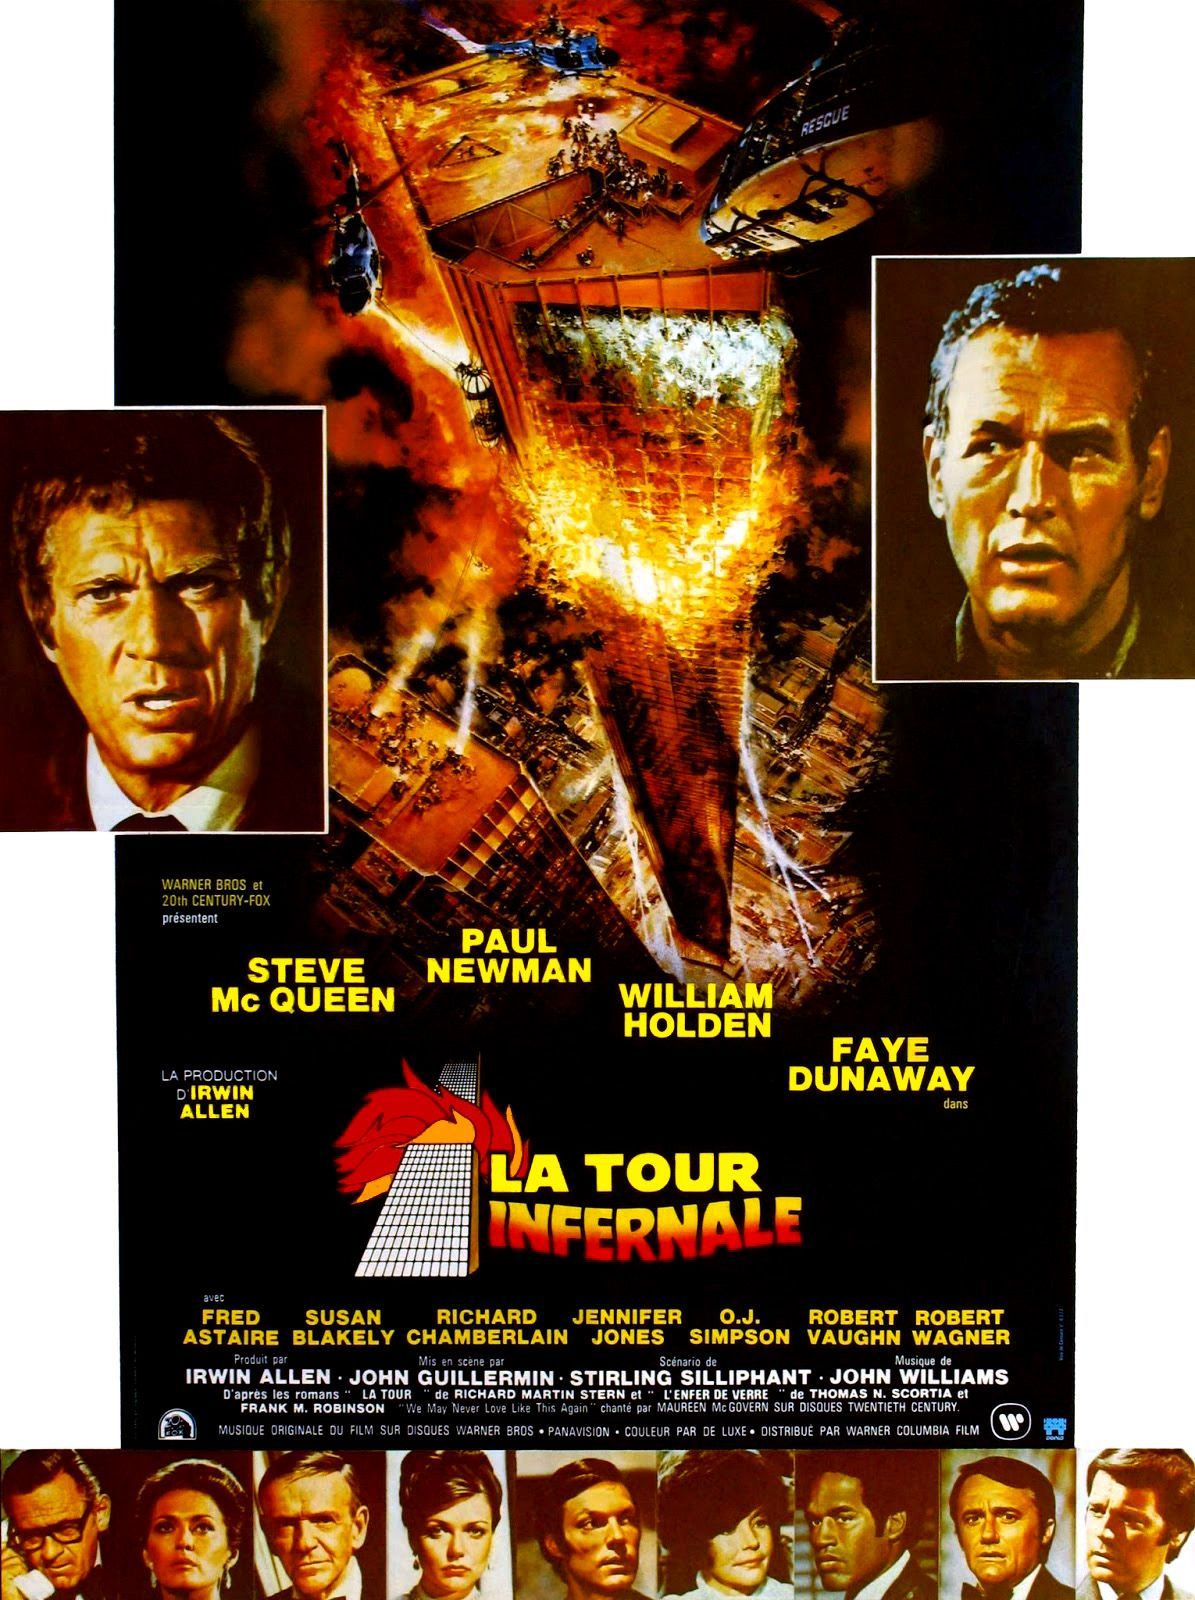 La Tour infernale de John Guillermin